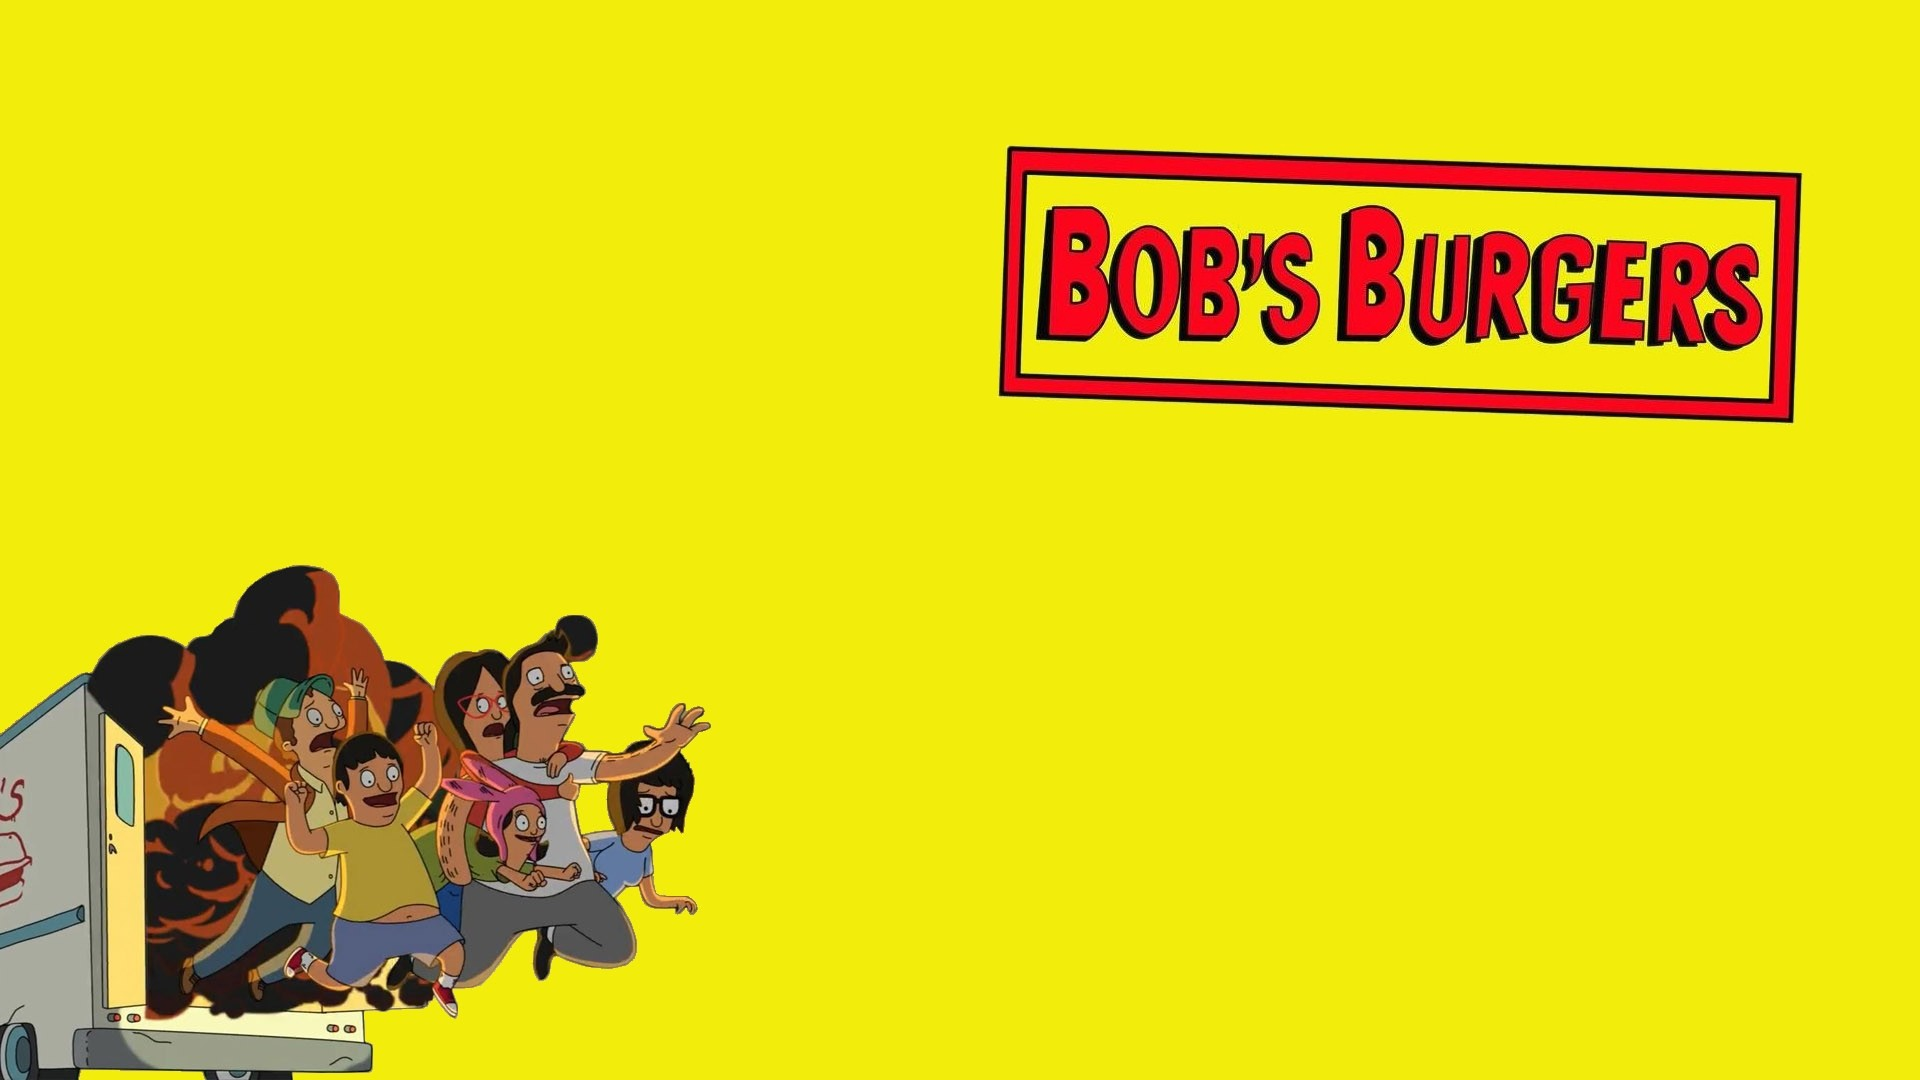 … tina bob s burgers wallpaper wallpapersafari …